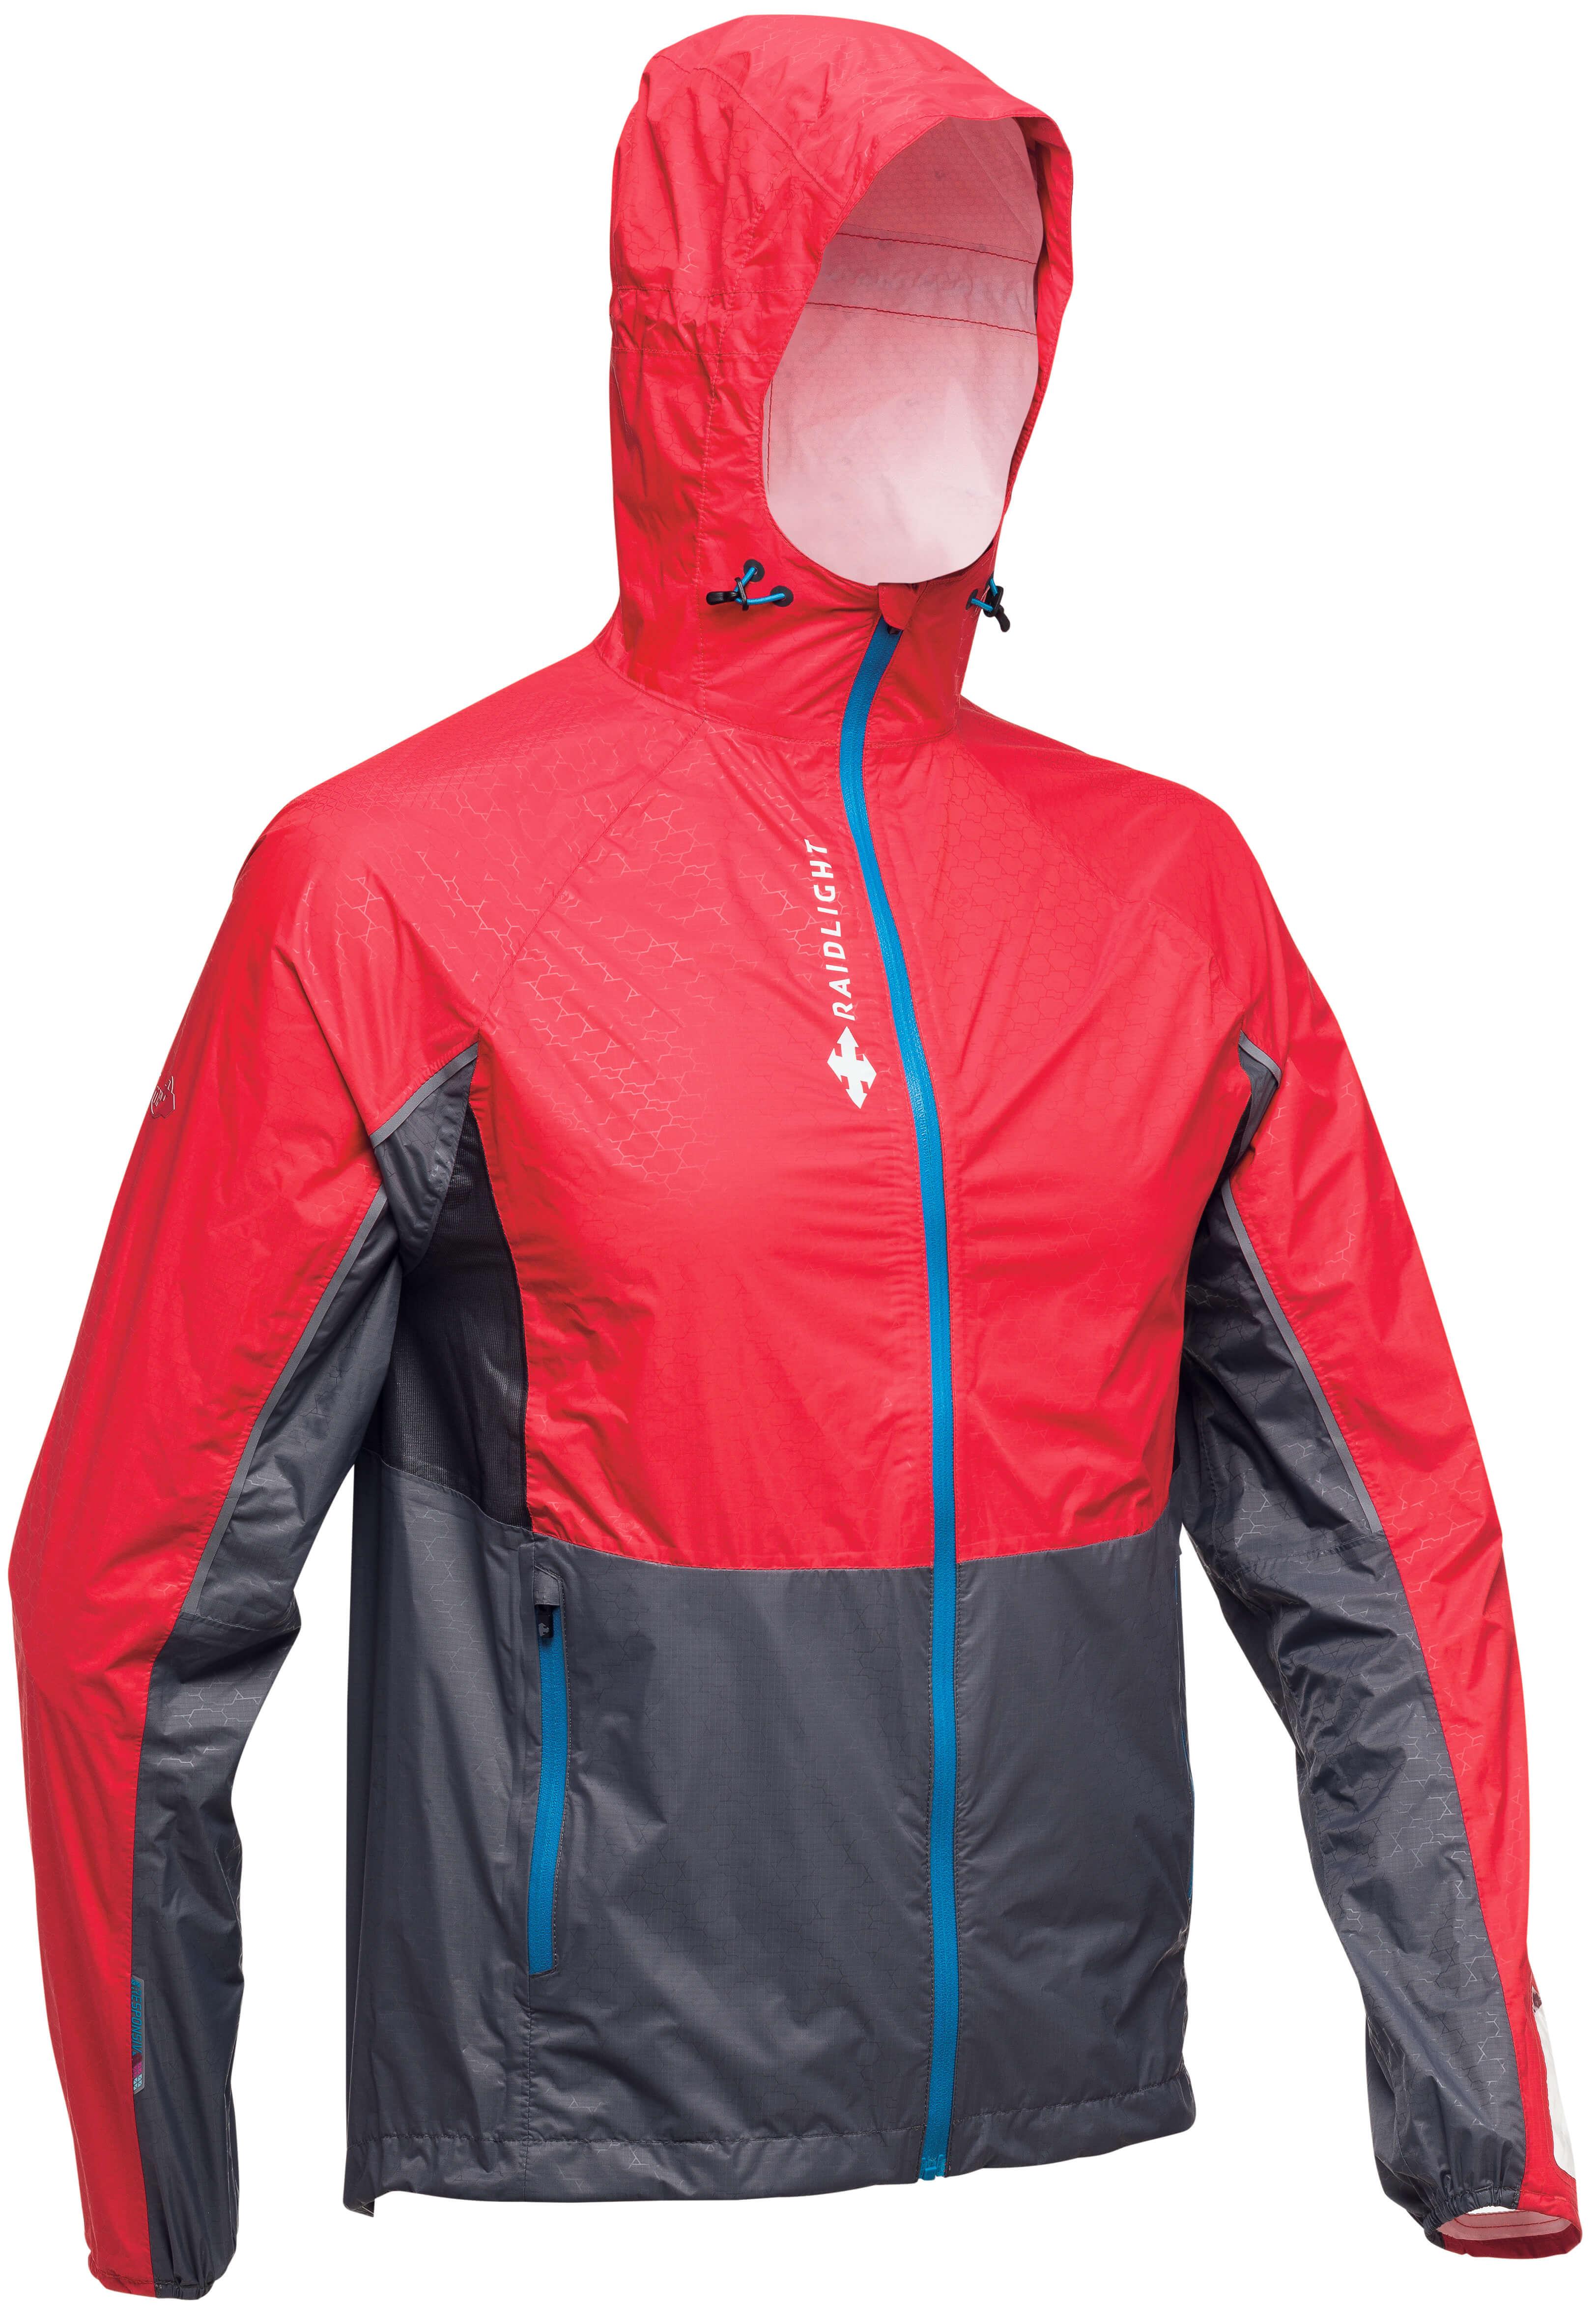 Raidlight Responsiv Top Veste Extrem Jacket Homme OXuTiPkZ